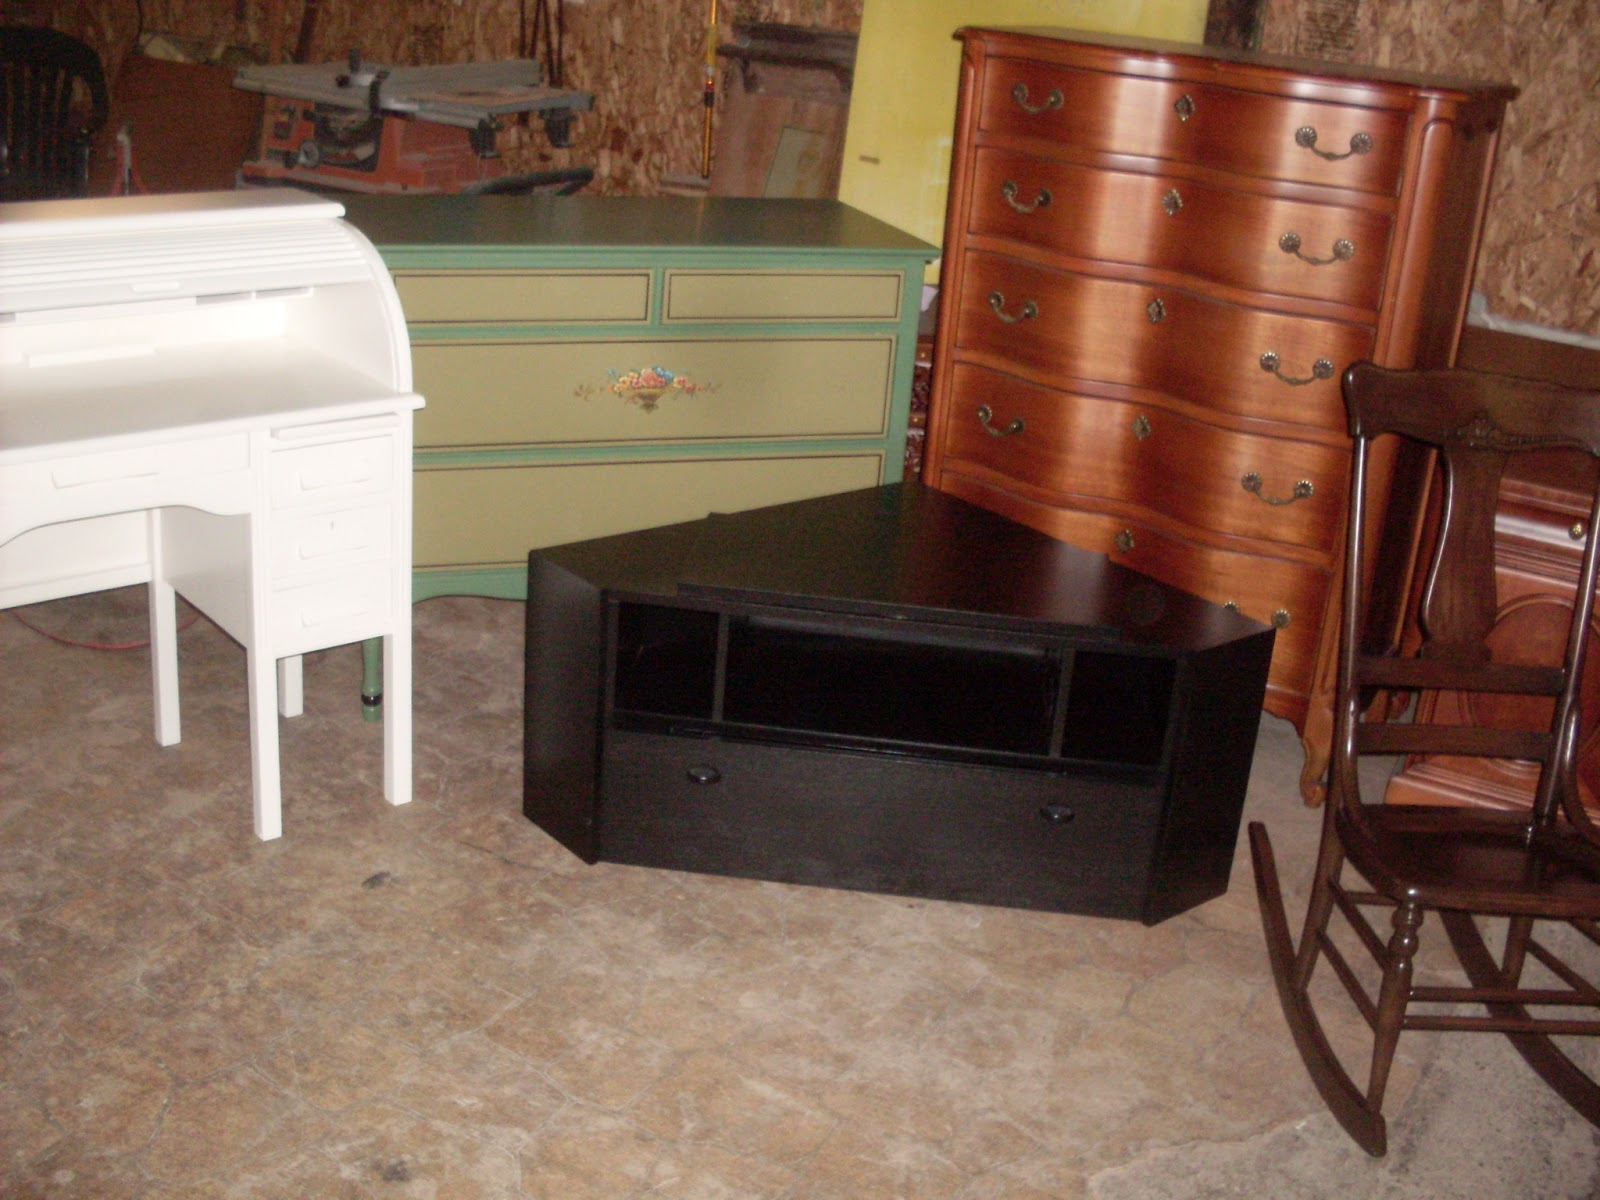 Furniture refinishing antique refinishing for Furniture restoration